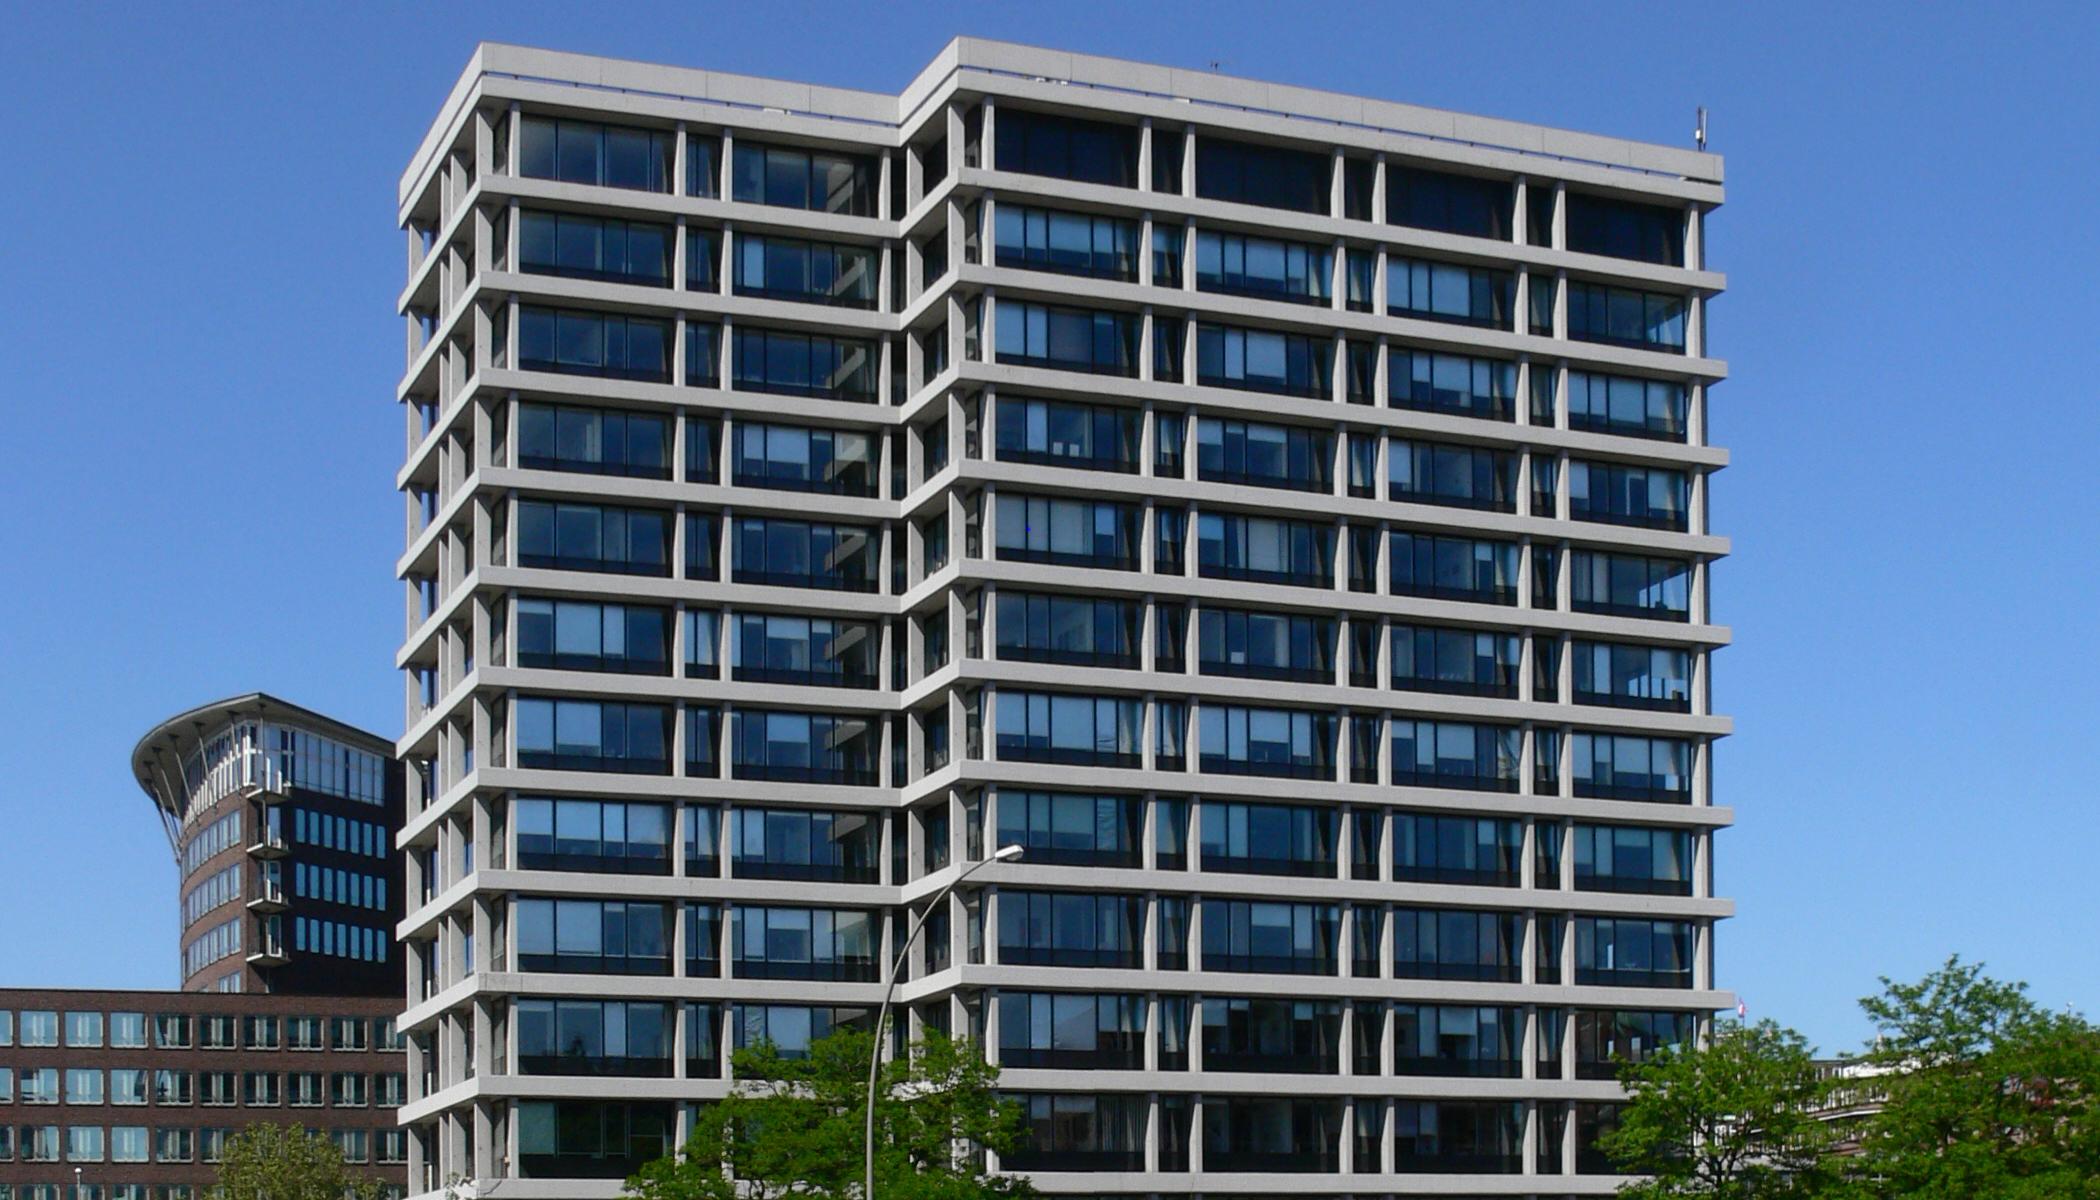 City hof schilleroper spiegelinsel hier soll bald for Hamburg spiegel